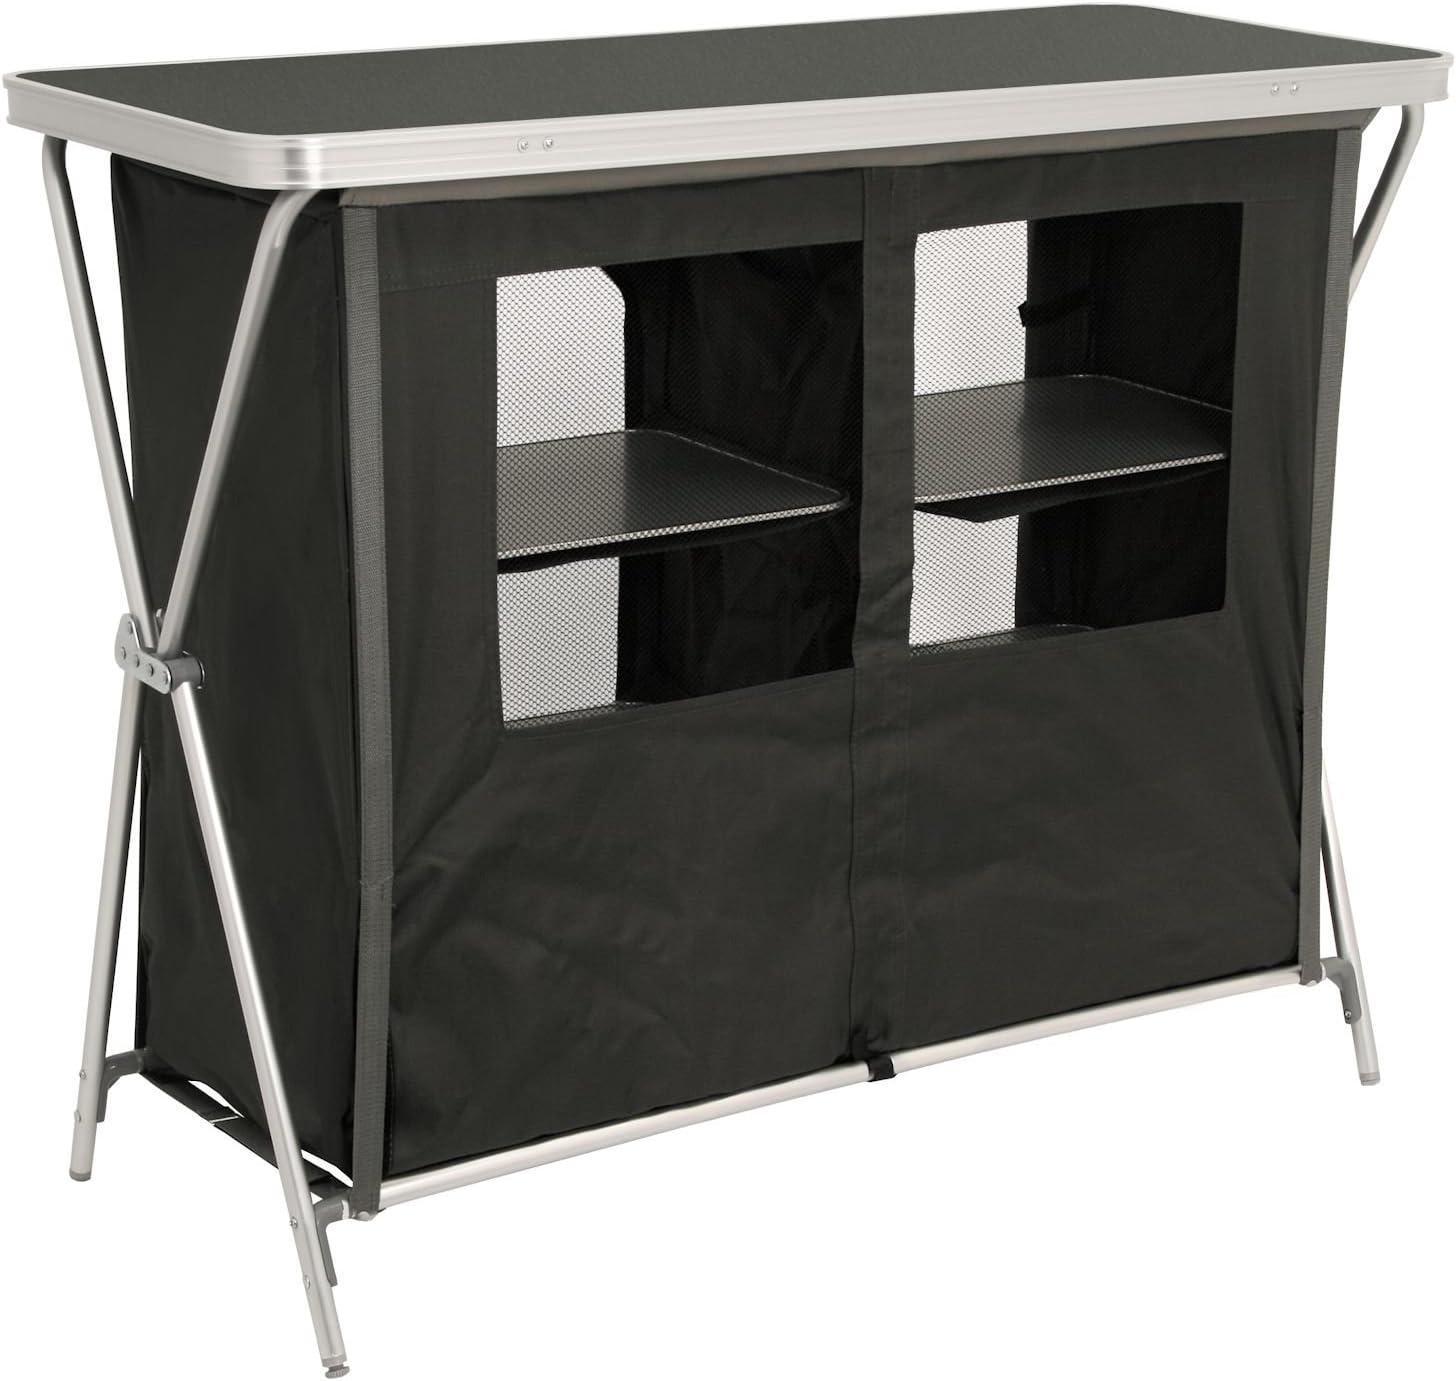 CampFeuer - Armario de camping, cocina de camping con estructura de aluminio, aprox. 110 cm de largo x 47 cm de ancho x 90 cm de alto.